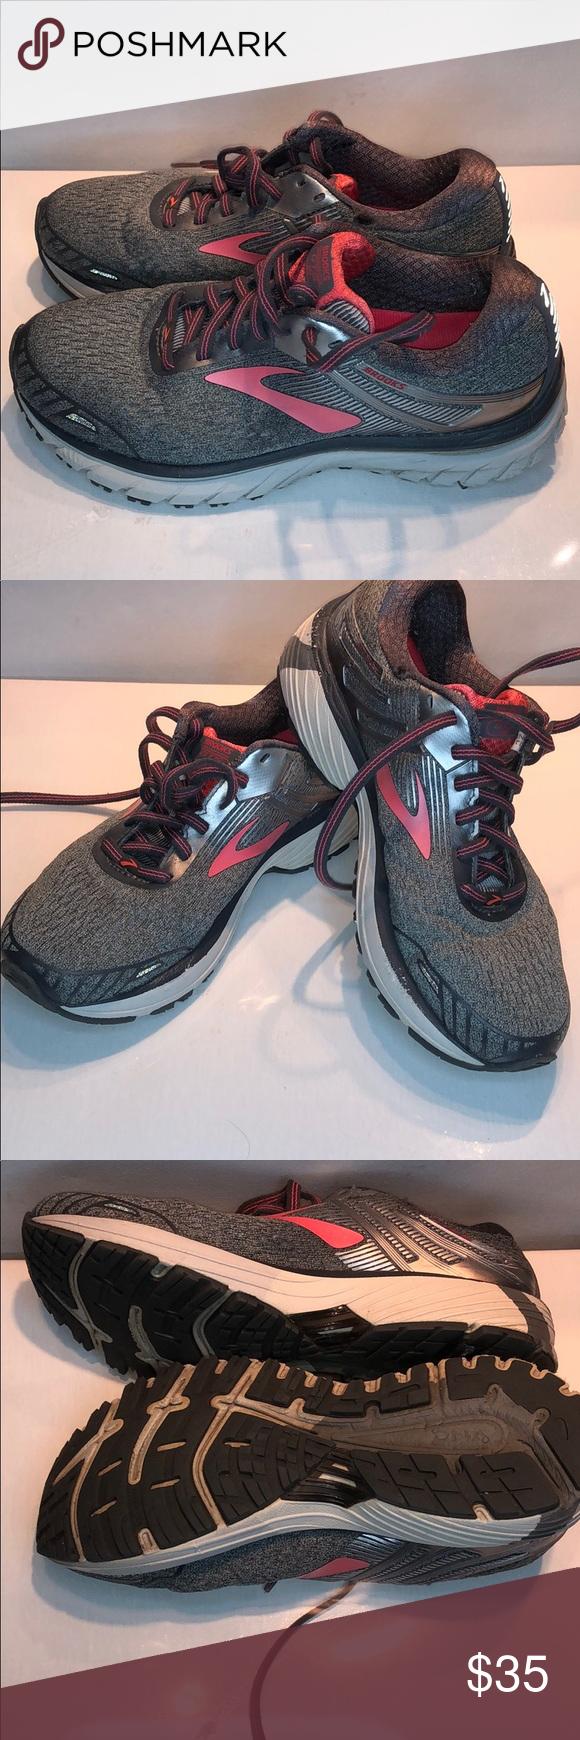 Brooks Adrenaline Gts 18 Size 7 Brooks Women Shoes